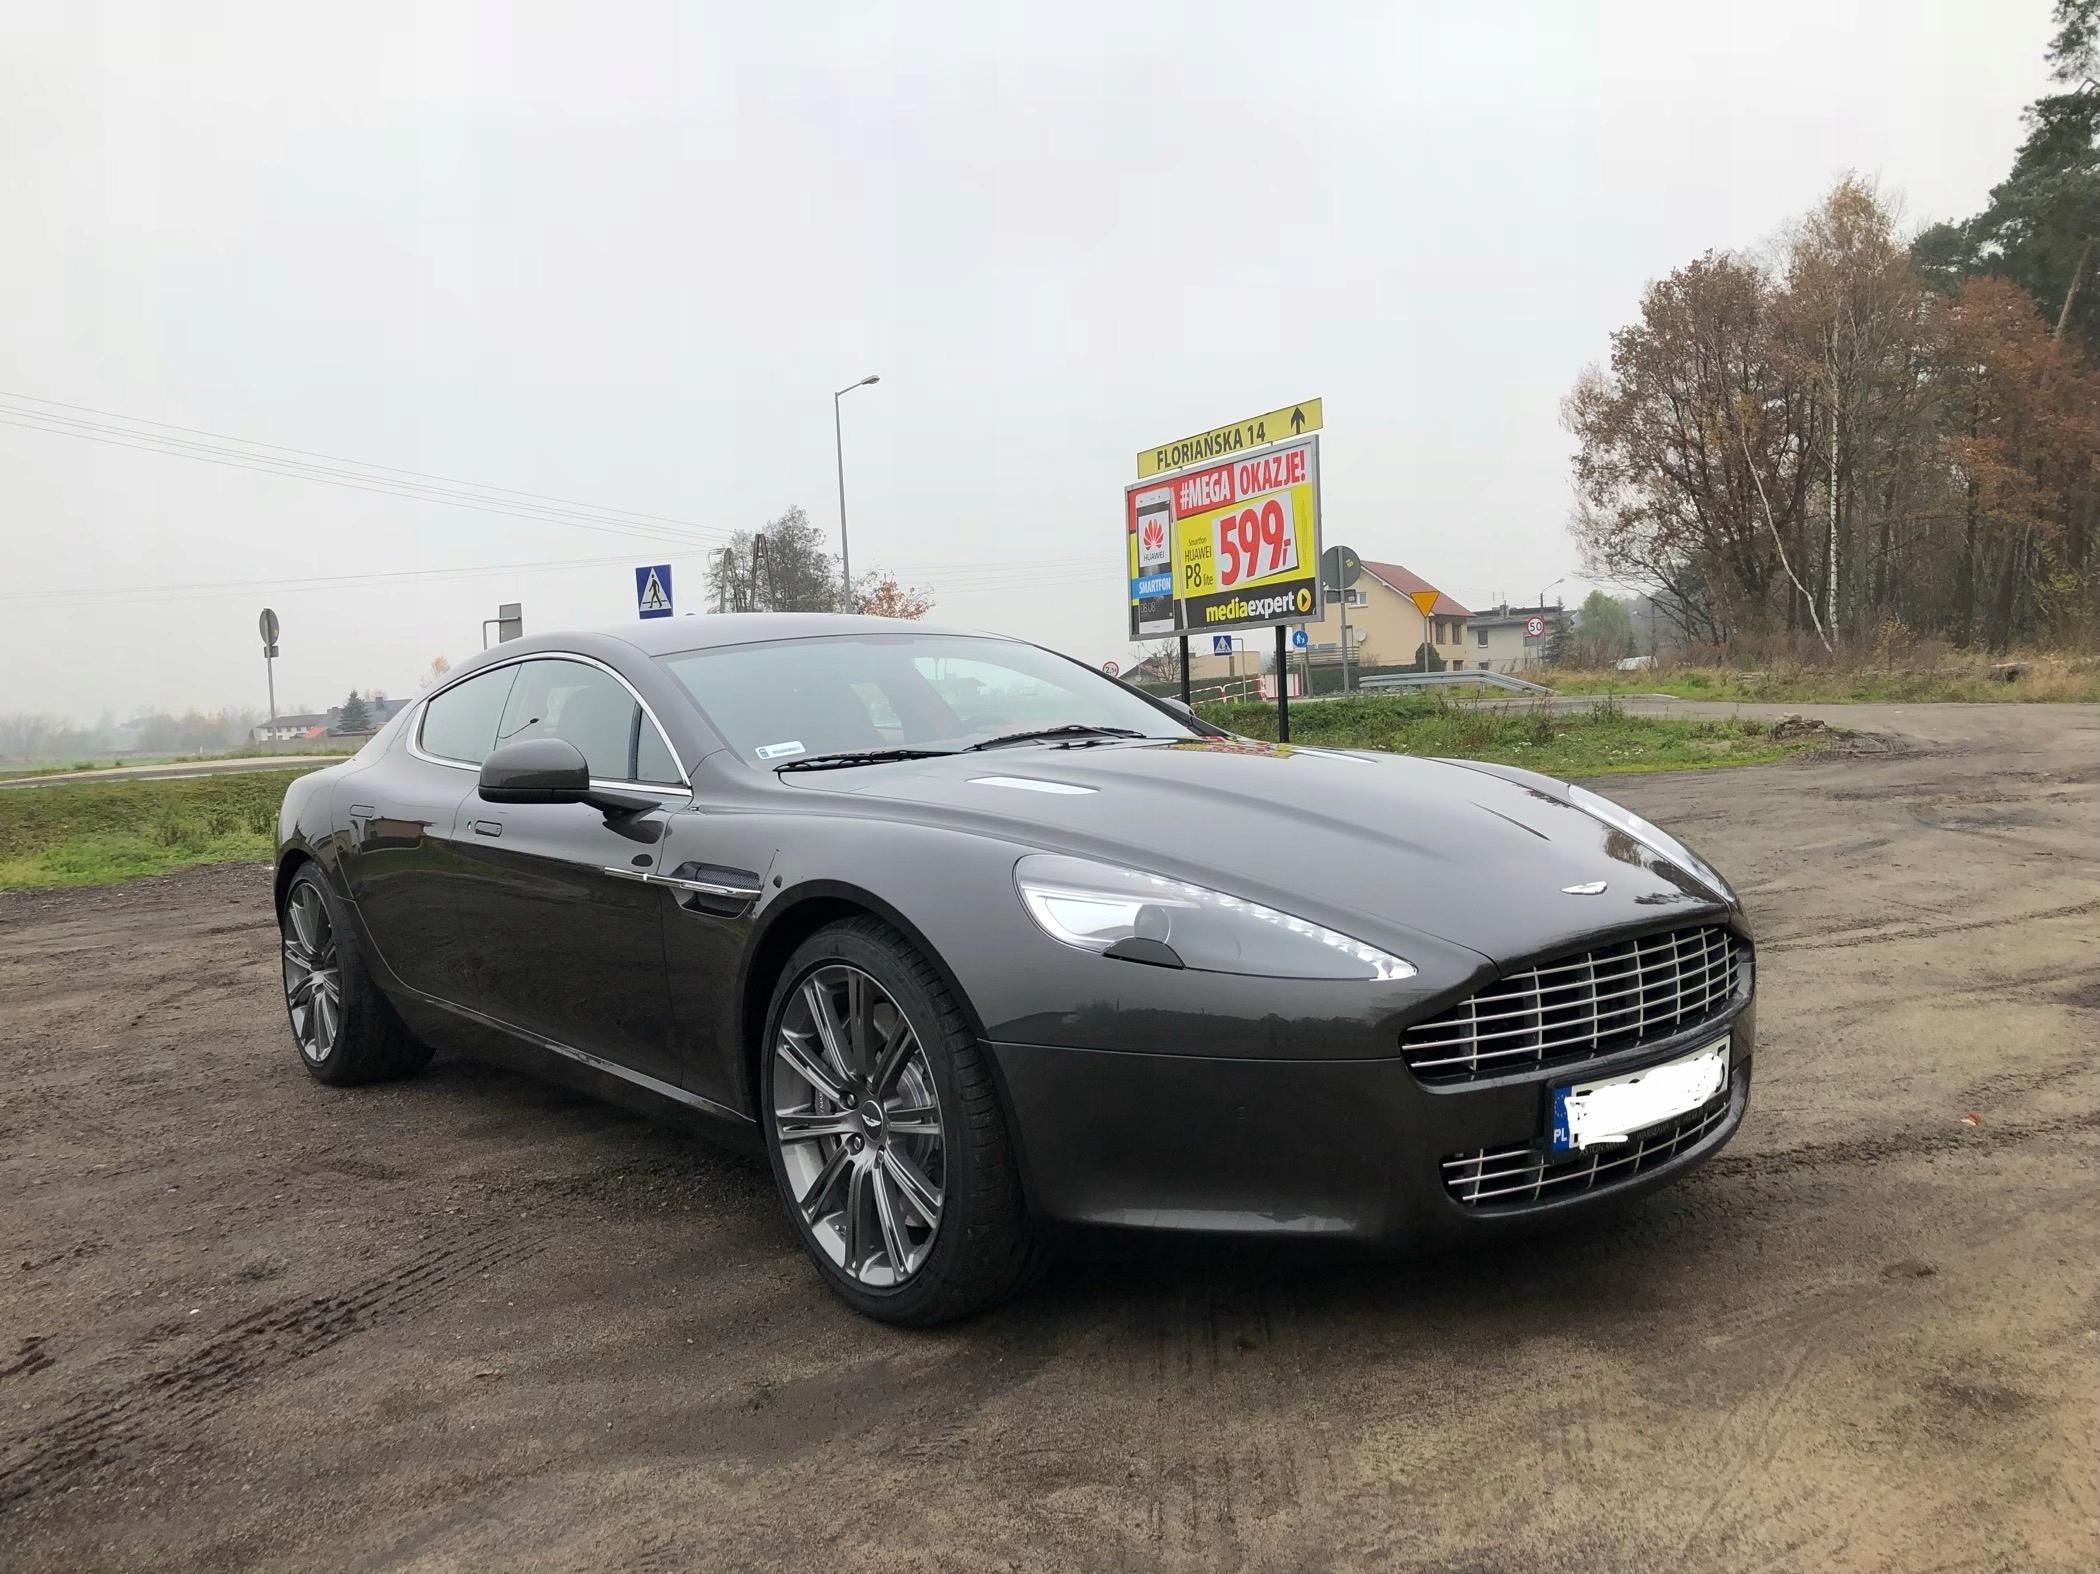 Aston Martin W Oficjalnym Archiwum Allegro Archiwum Ofert